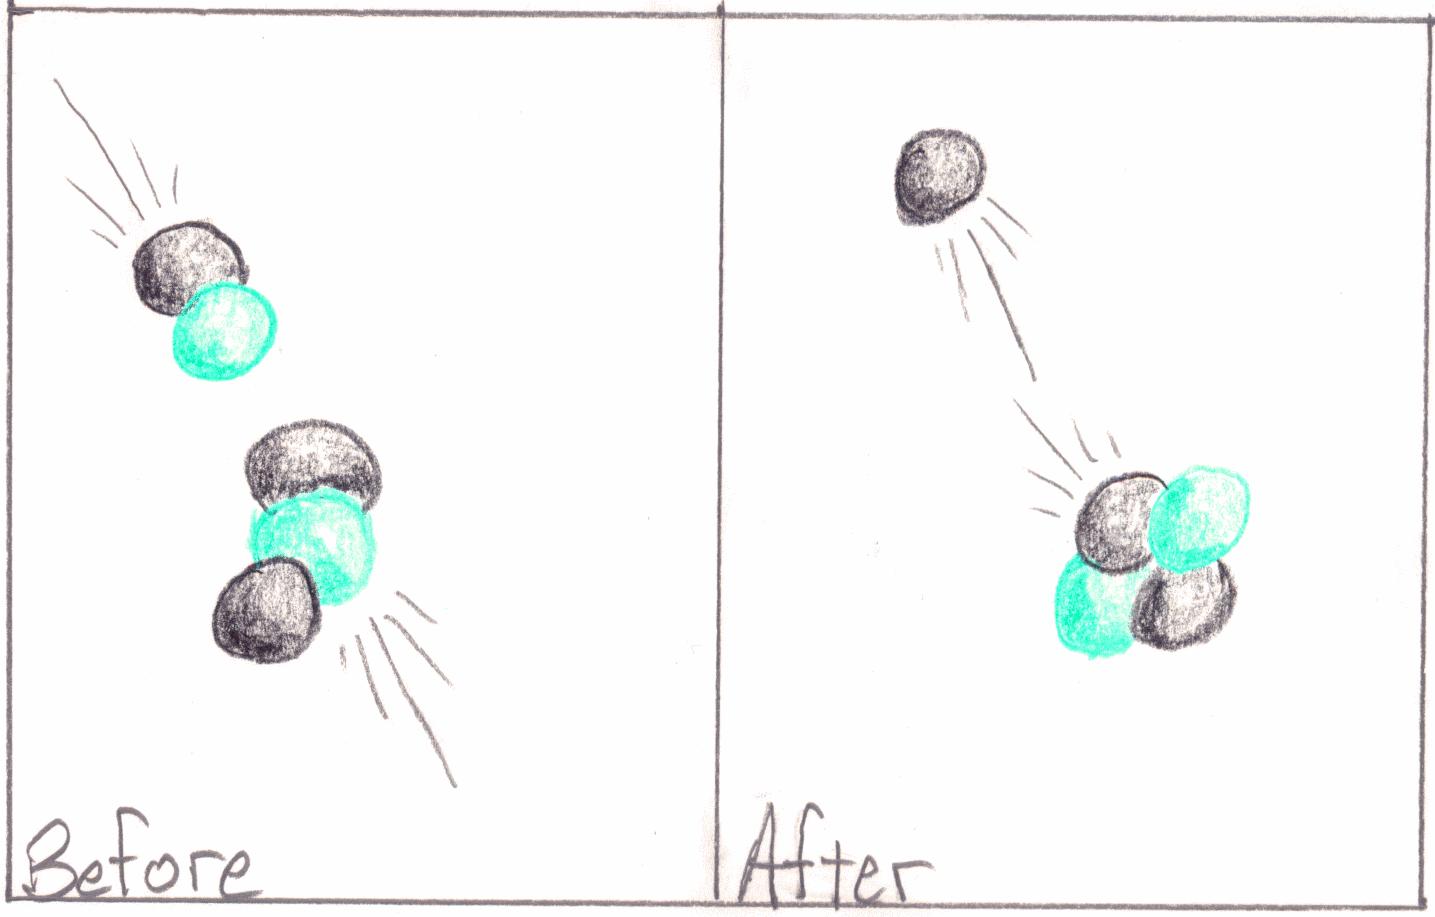 Nuclear Fusion Equation